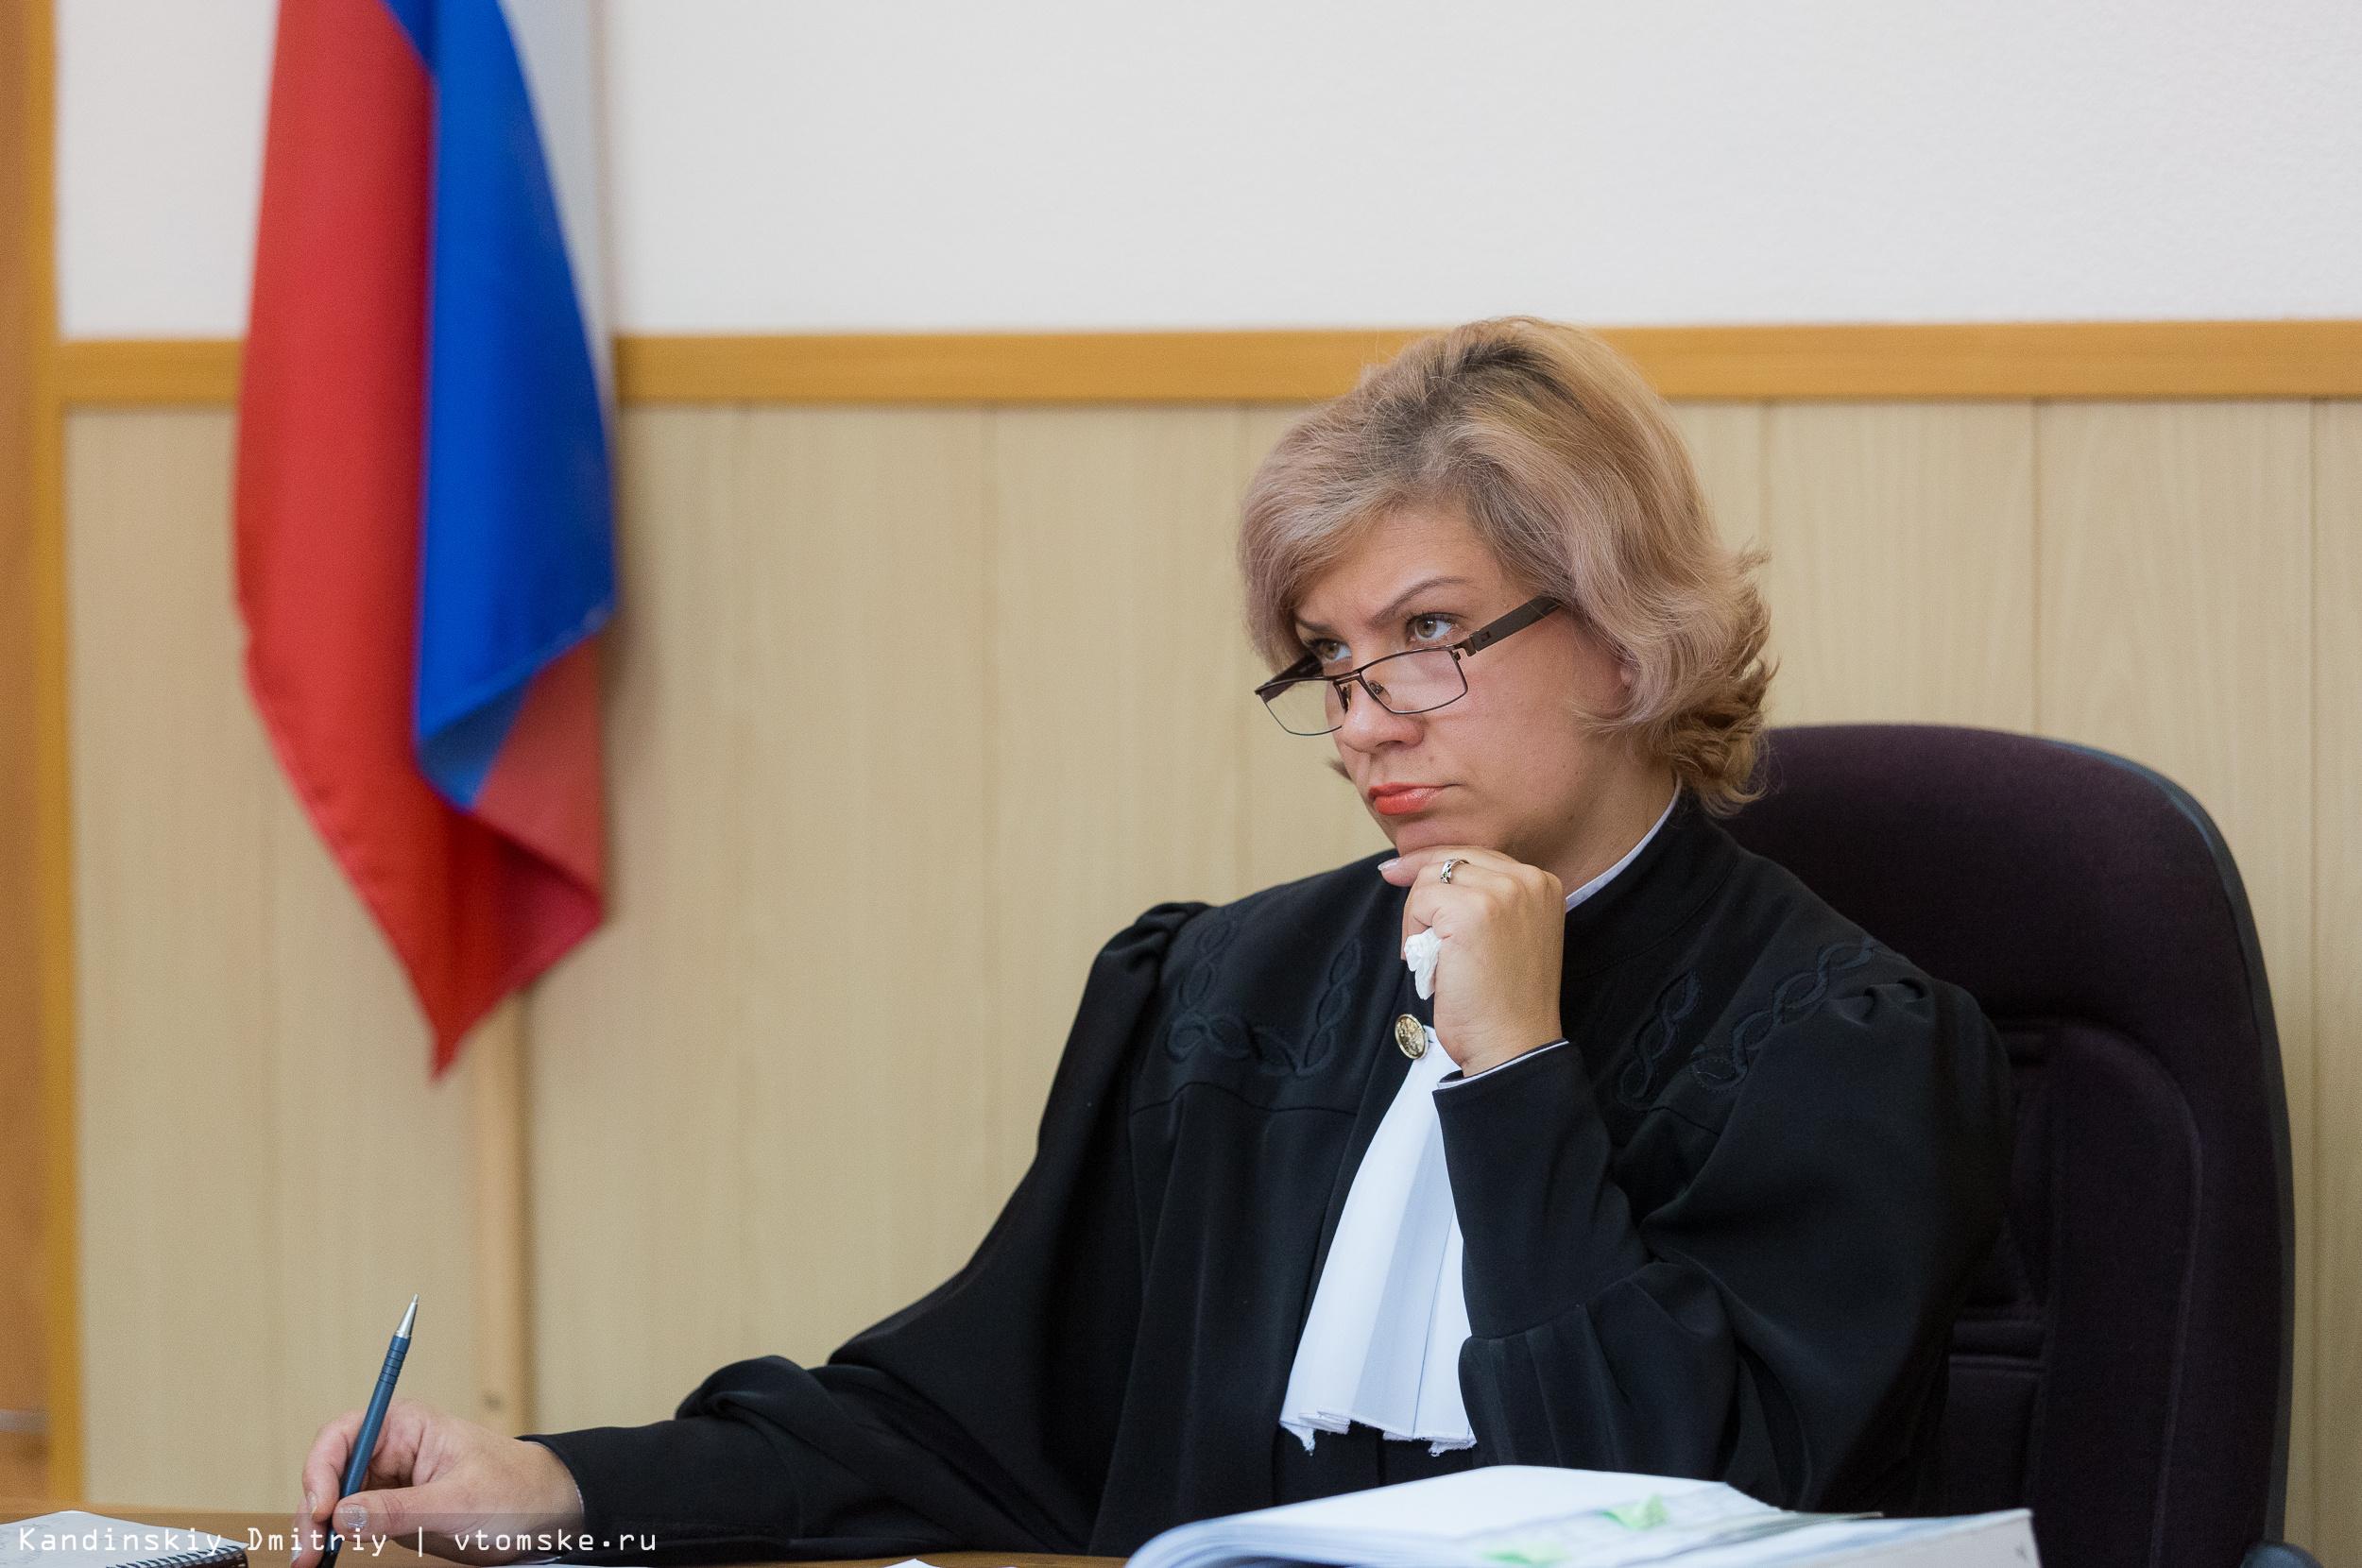 Фото секс в суде 7 фотография